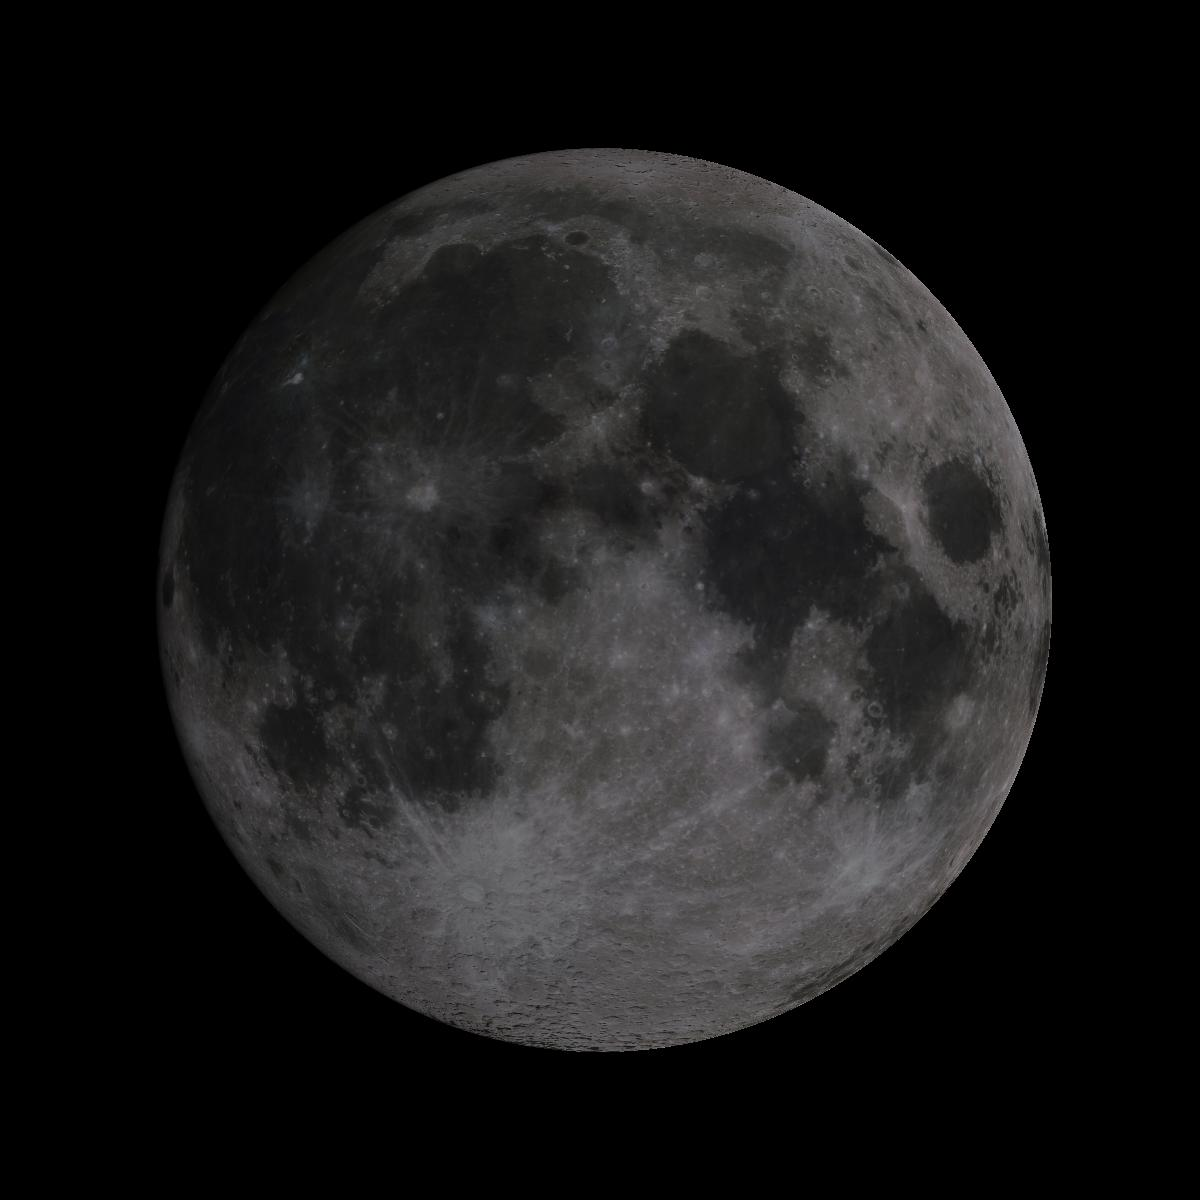 Lune du 16 juillet 2019